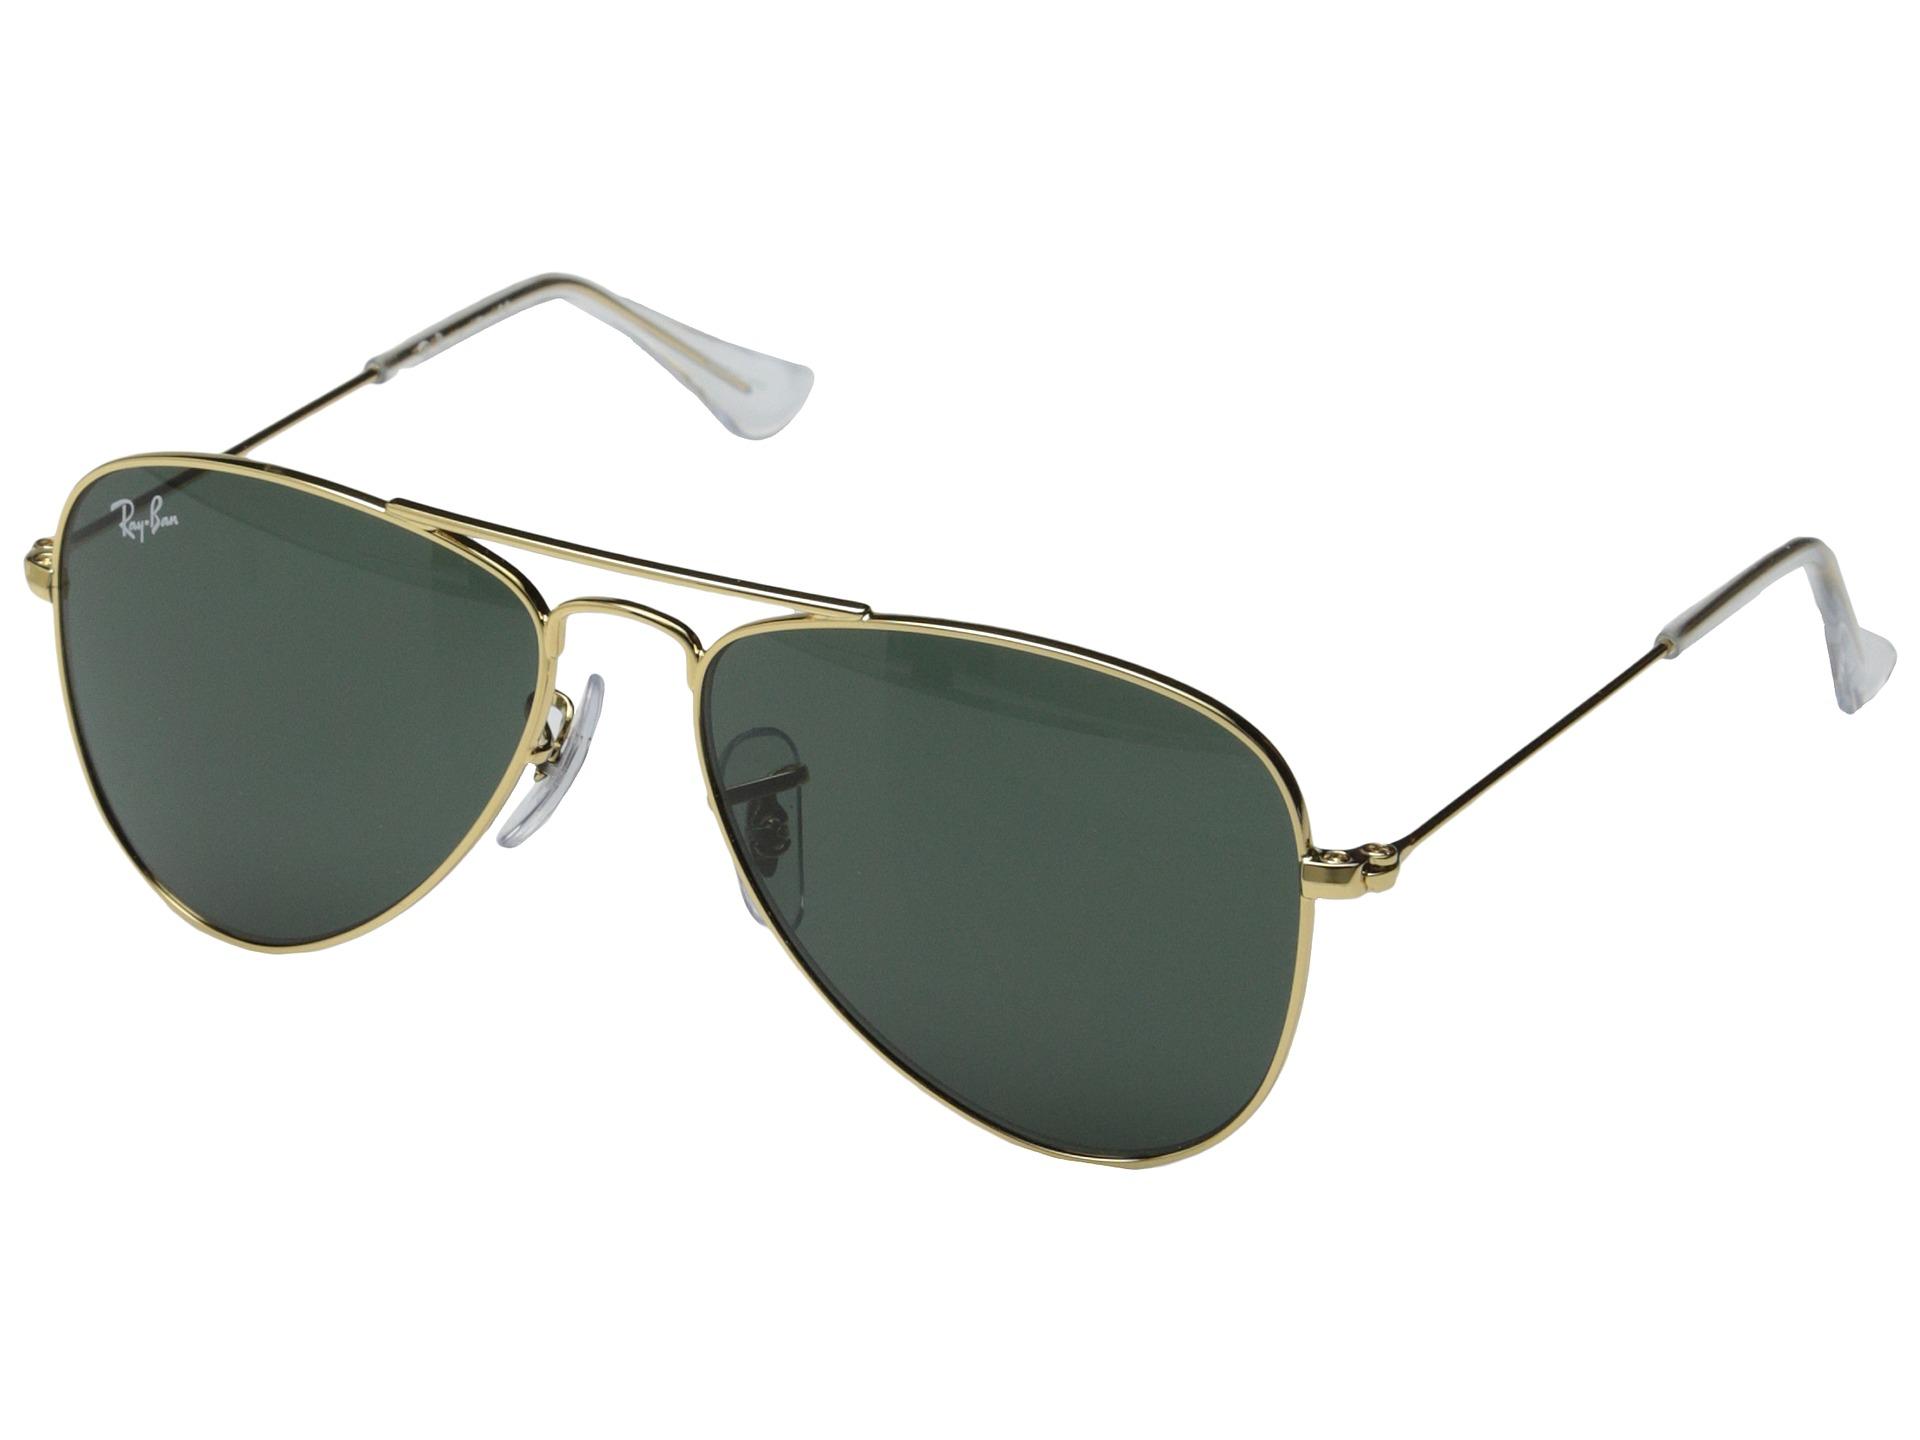 sunglasses ray ban sale real cheap oakley sunglasses sun glasses ray ban. Black Bedroom Furniture Sets. Home Design Ideas